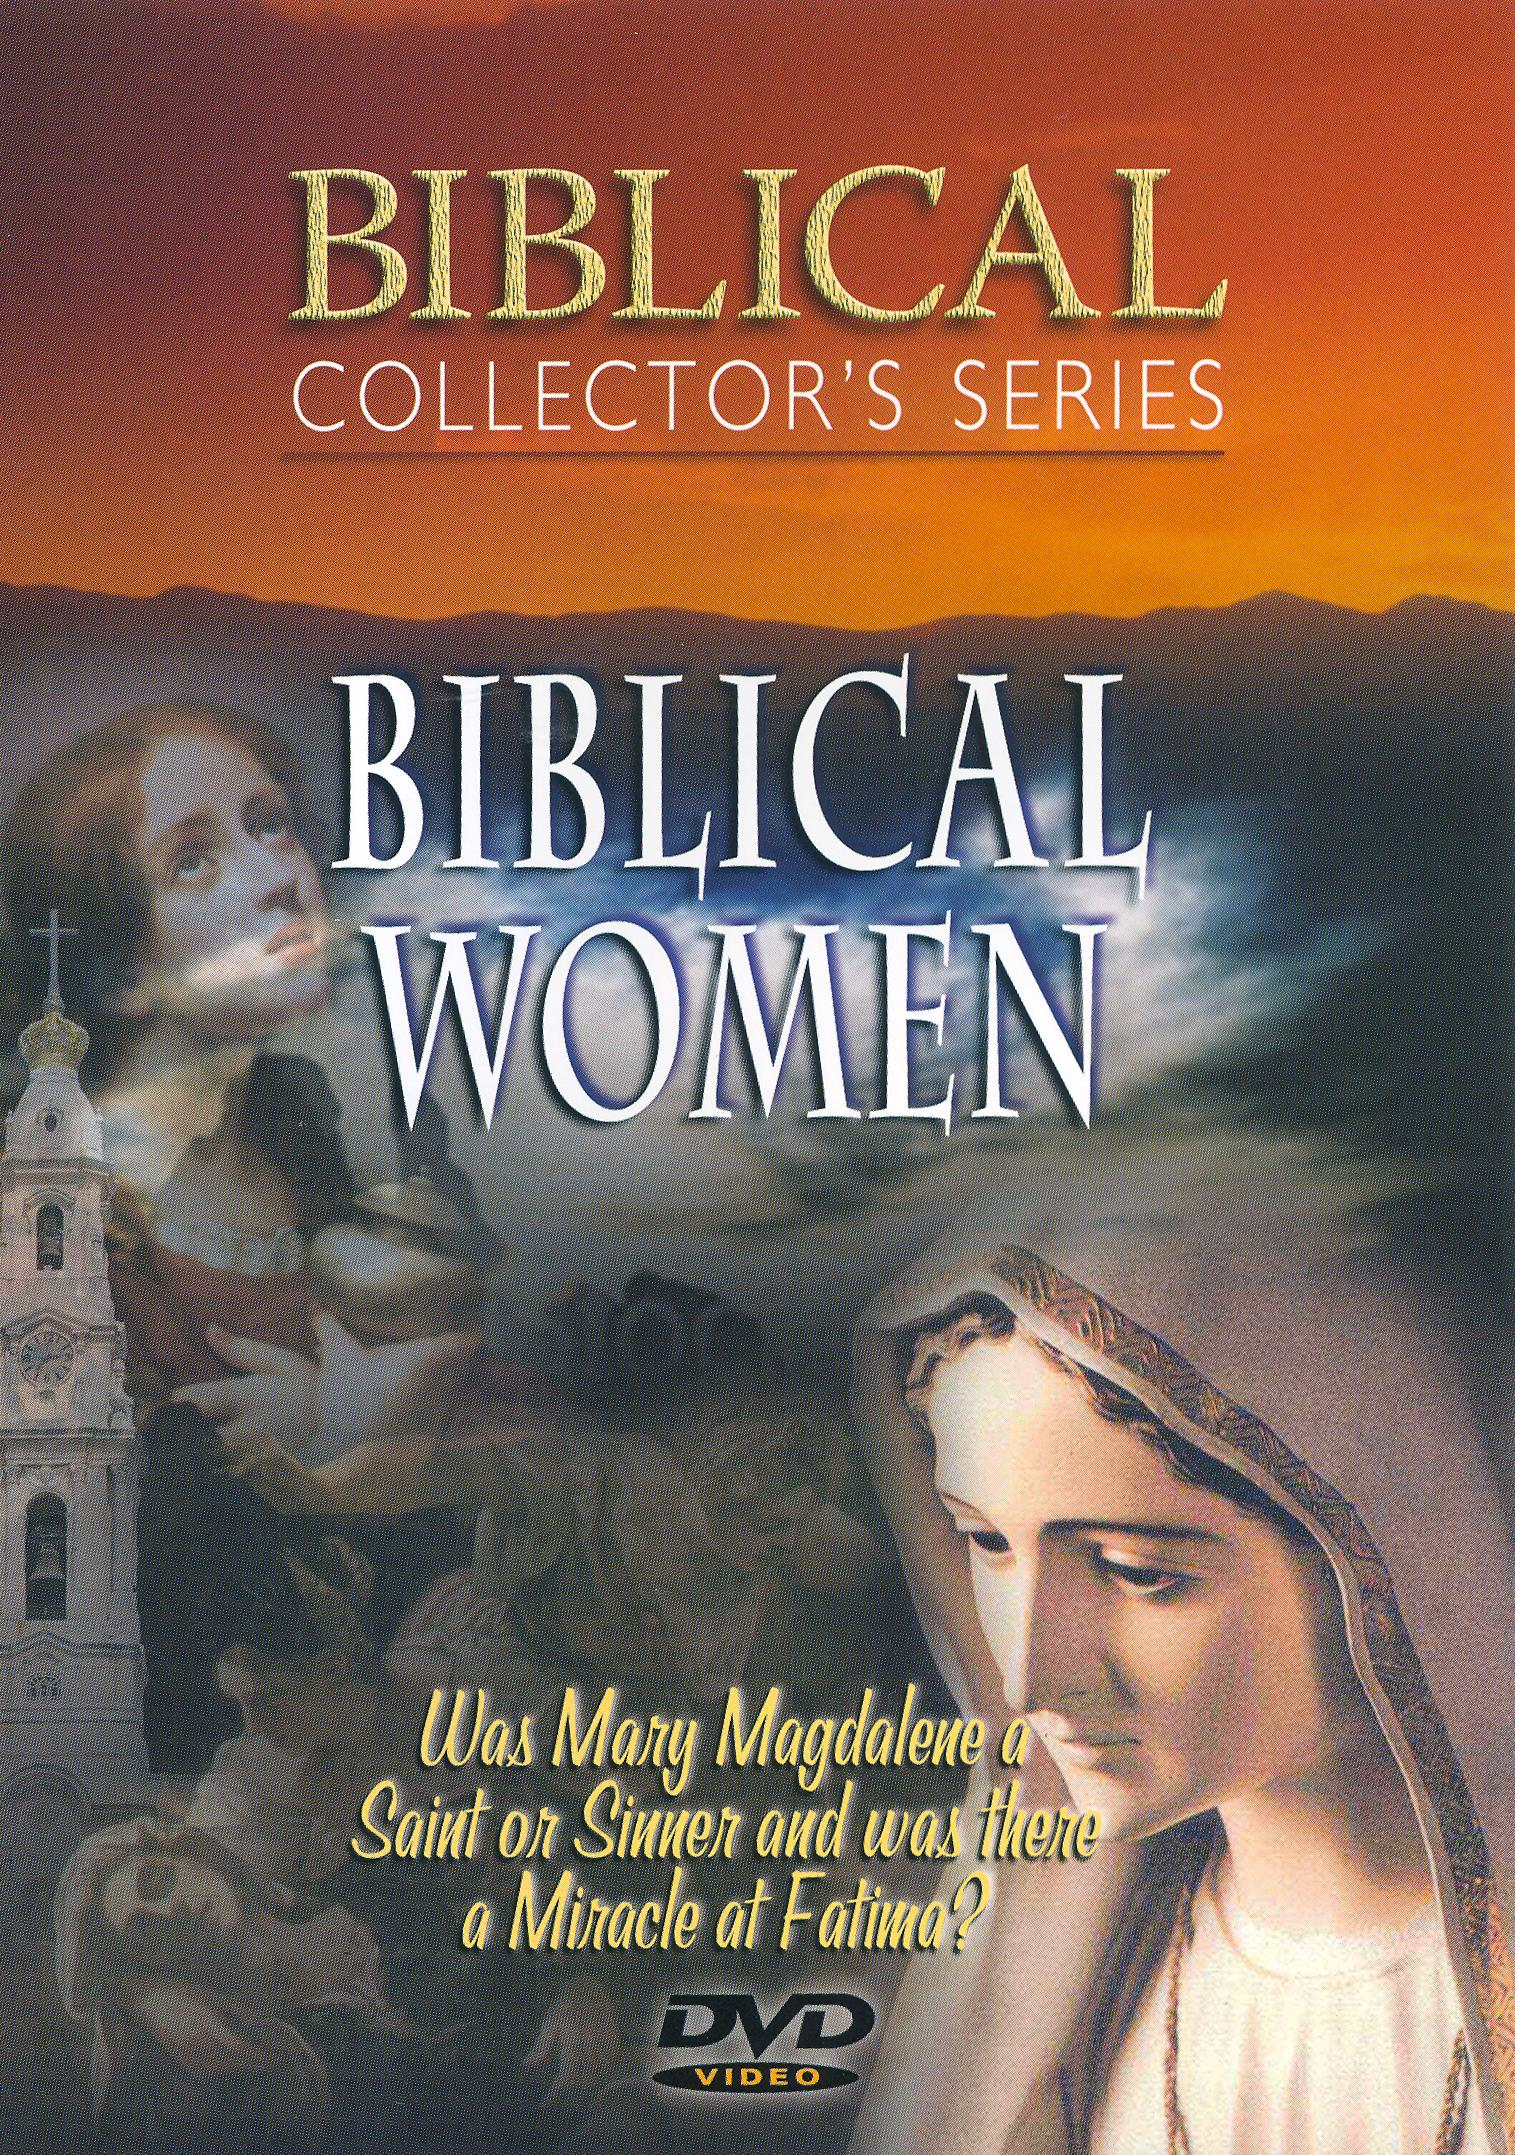 Biblical Collector's Series: Biblical Women